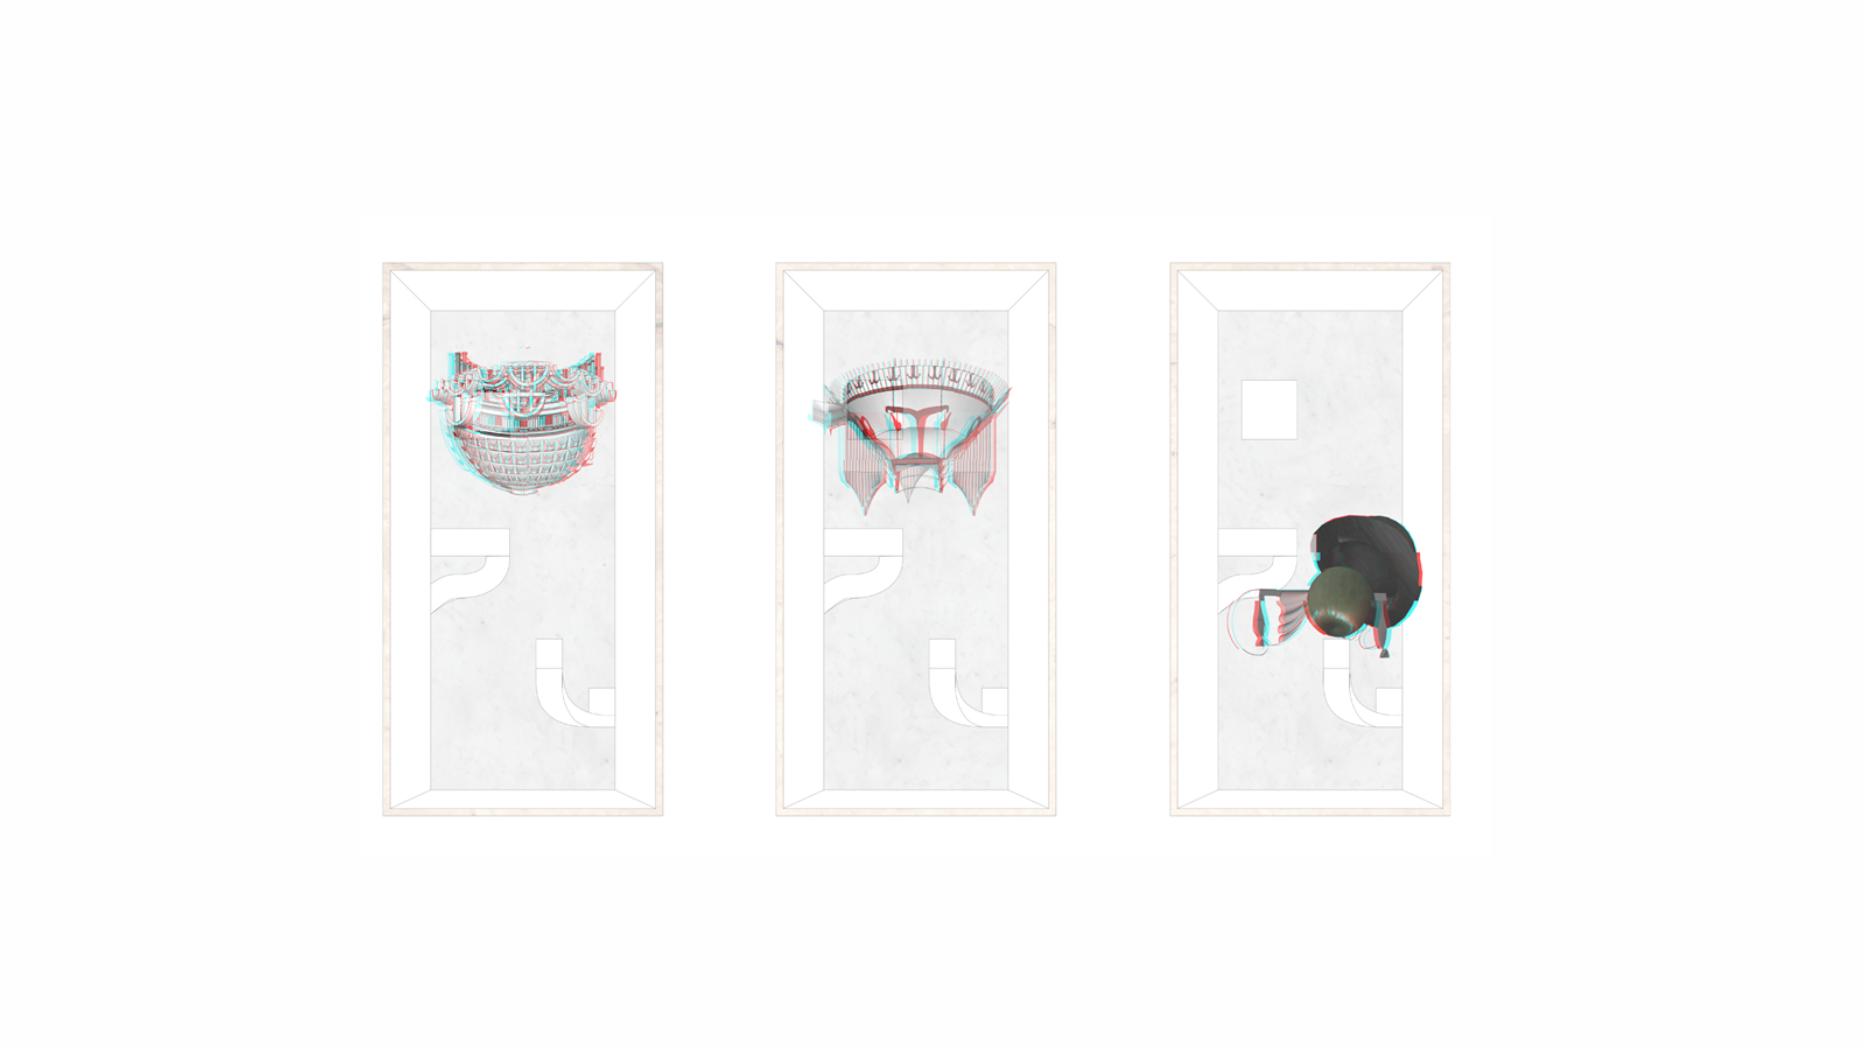 nita, A. & Sifakis, D.|'New Paradigm of the Skyscraper', Virtual Reality Views